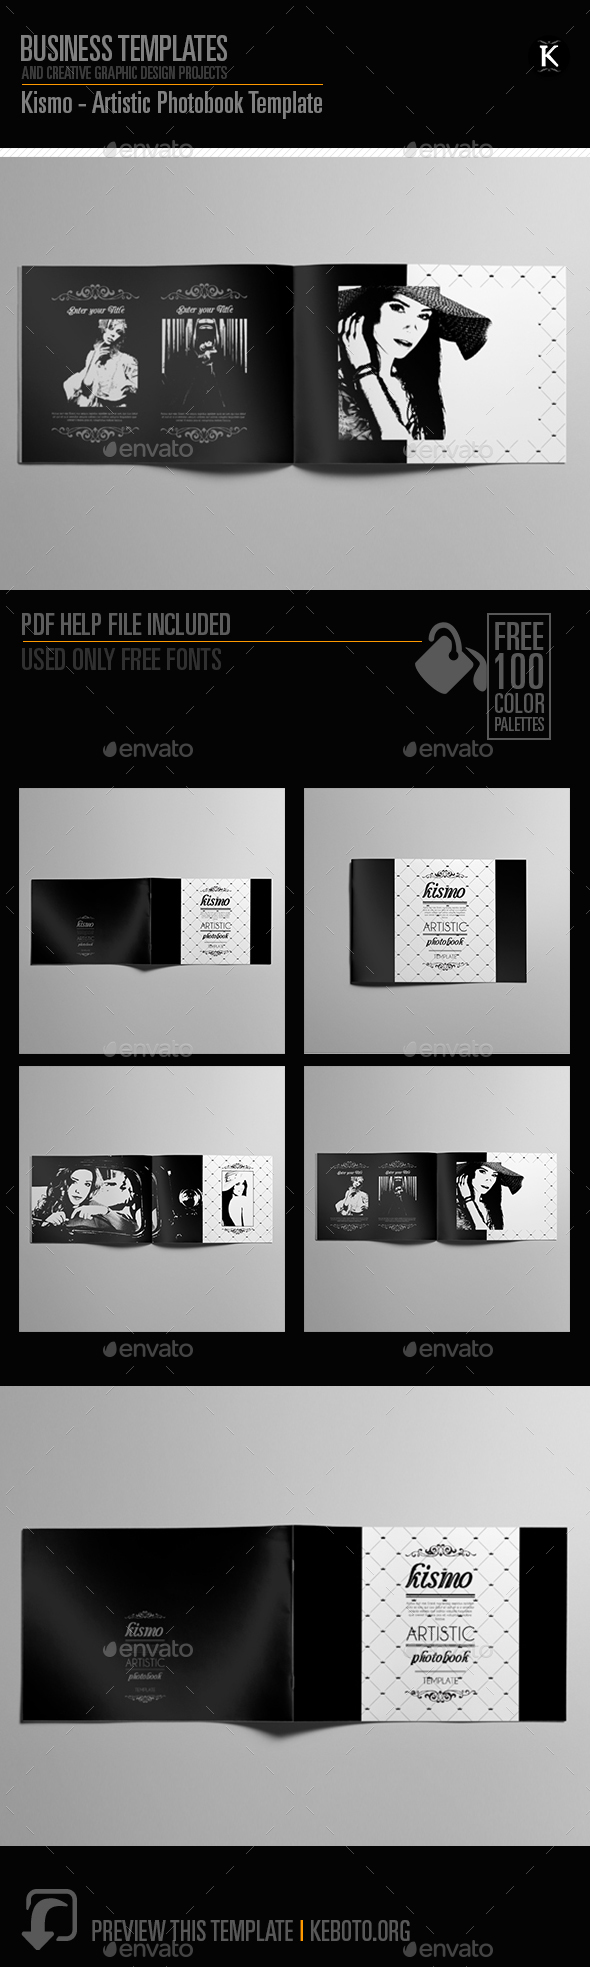 Kismo - Artistic Photobook Template - Photo Albums Print Templates